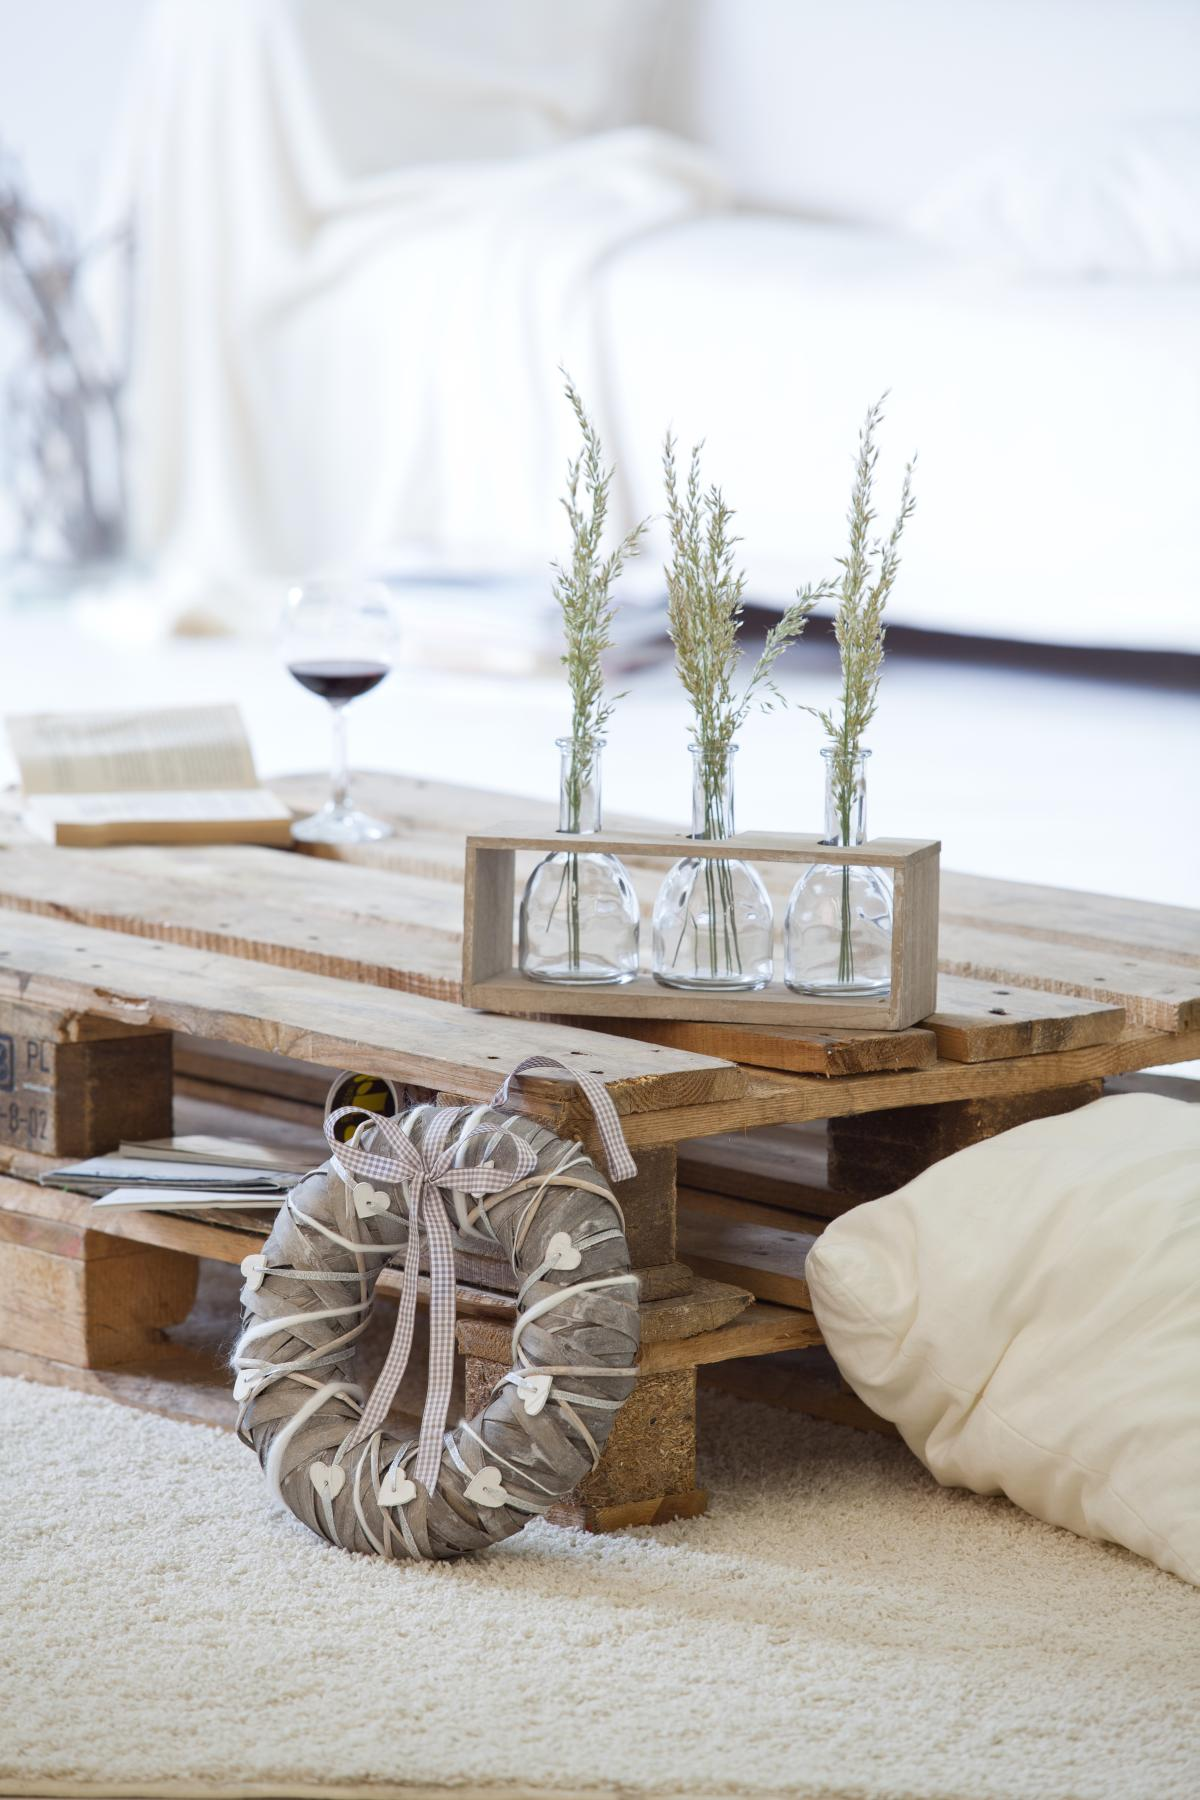 3 deko vasen im holzgestell g nstig online kaufen. Black Bedroom Furniture Sets. Home Design Ideas